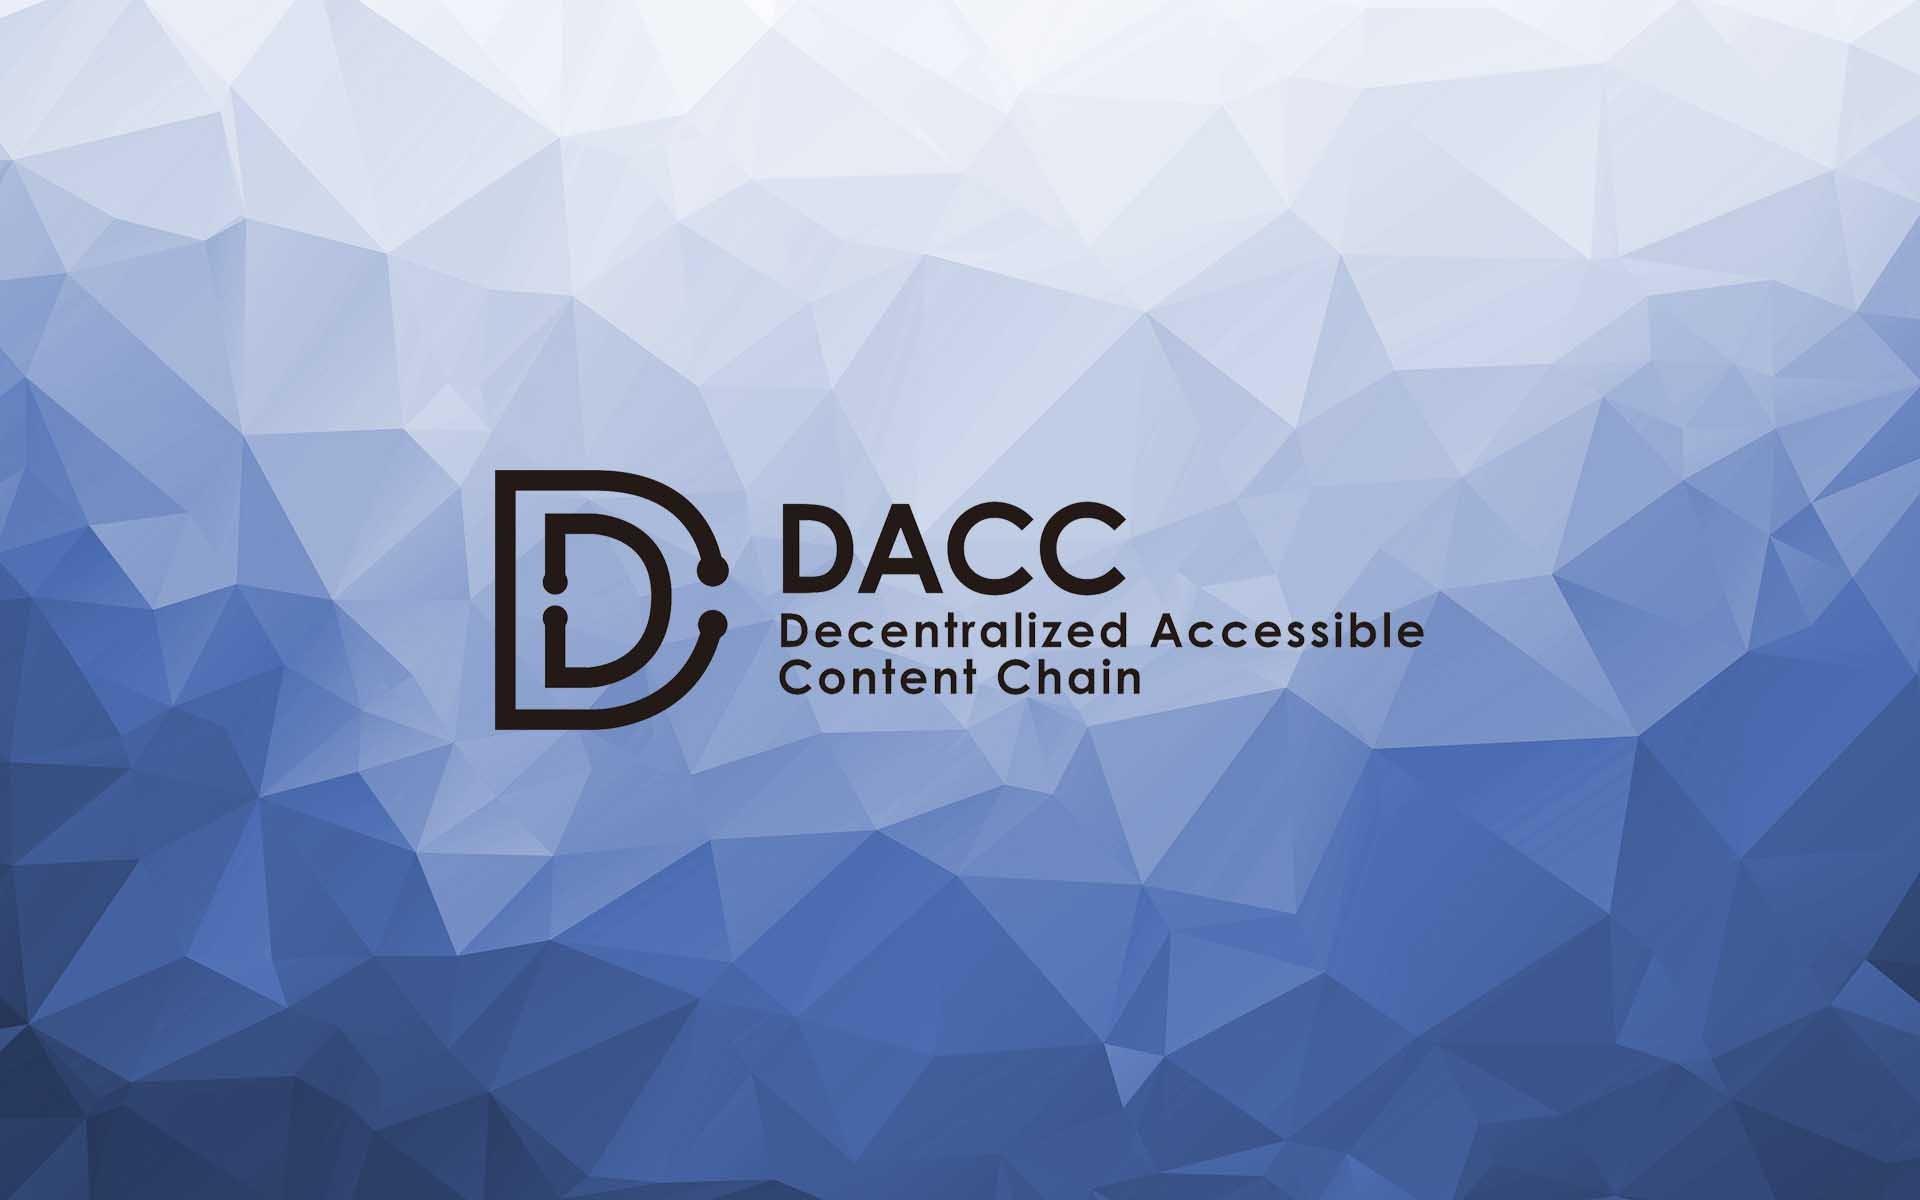 Groundbreaking Blockchain-based Content Platform Set to Revolutionise the Digital Content Industry